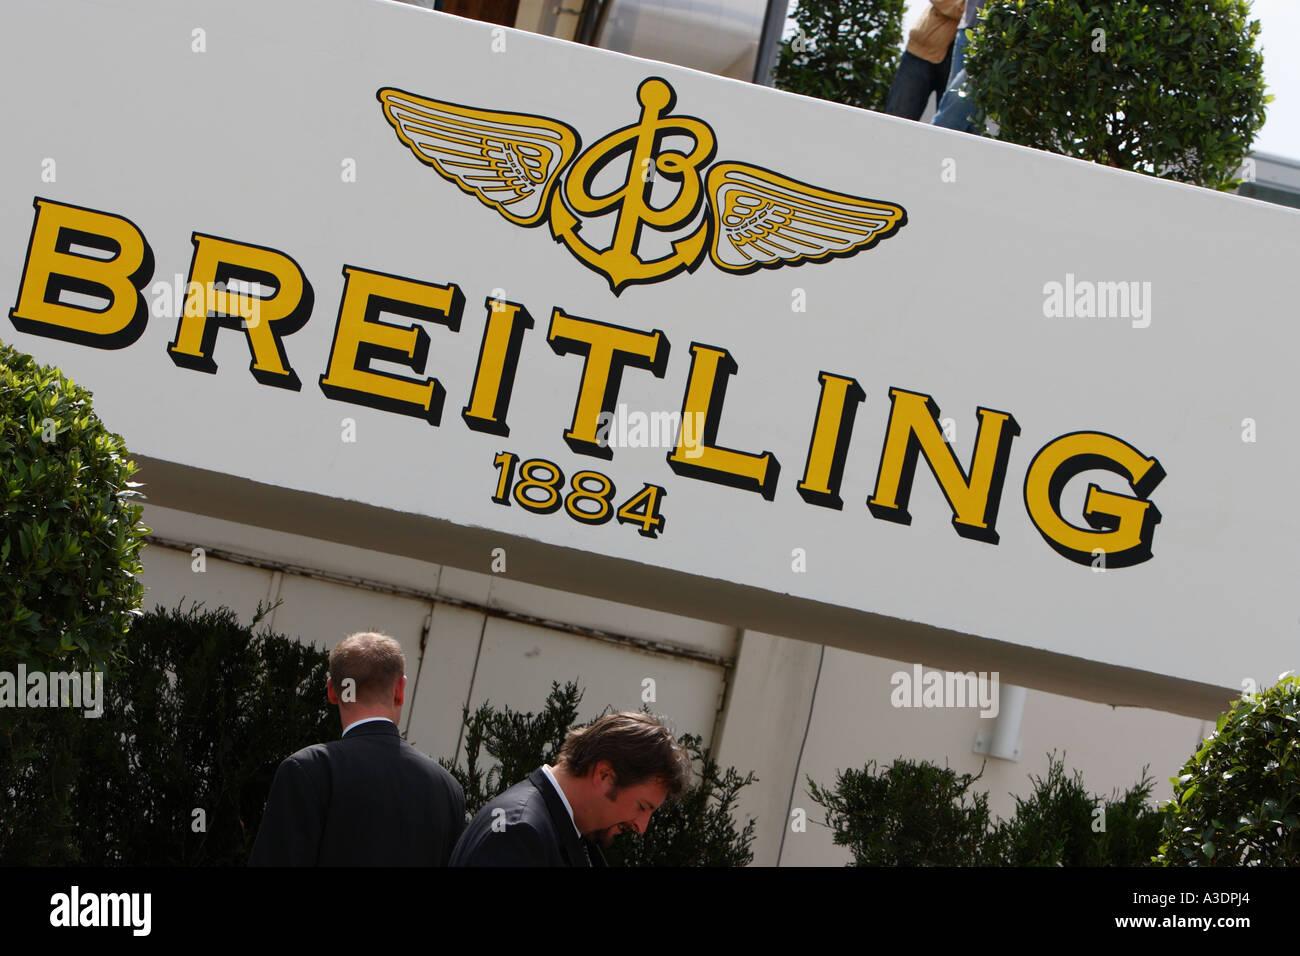 Breiting - Stock Image